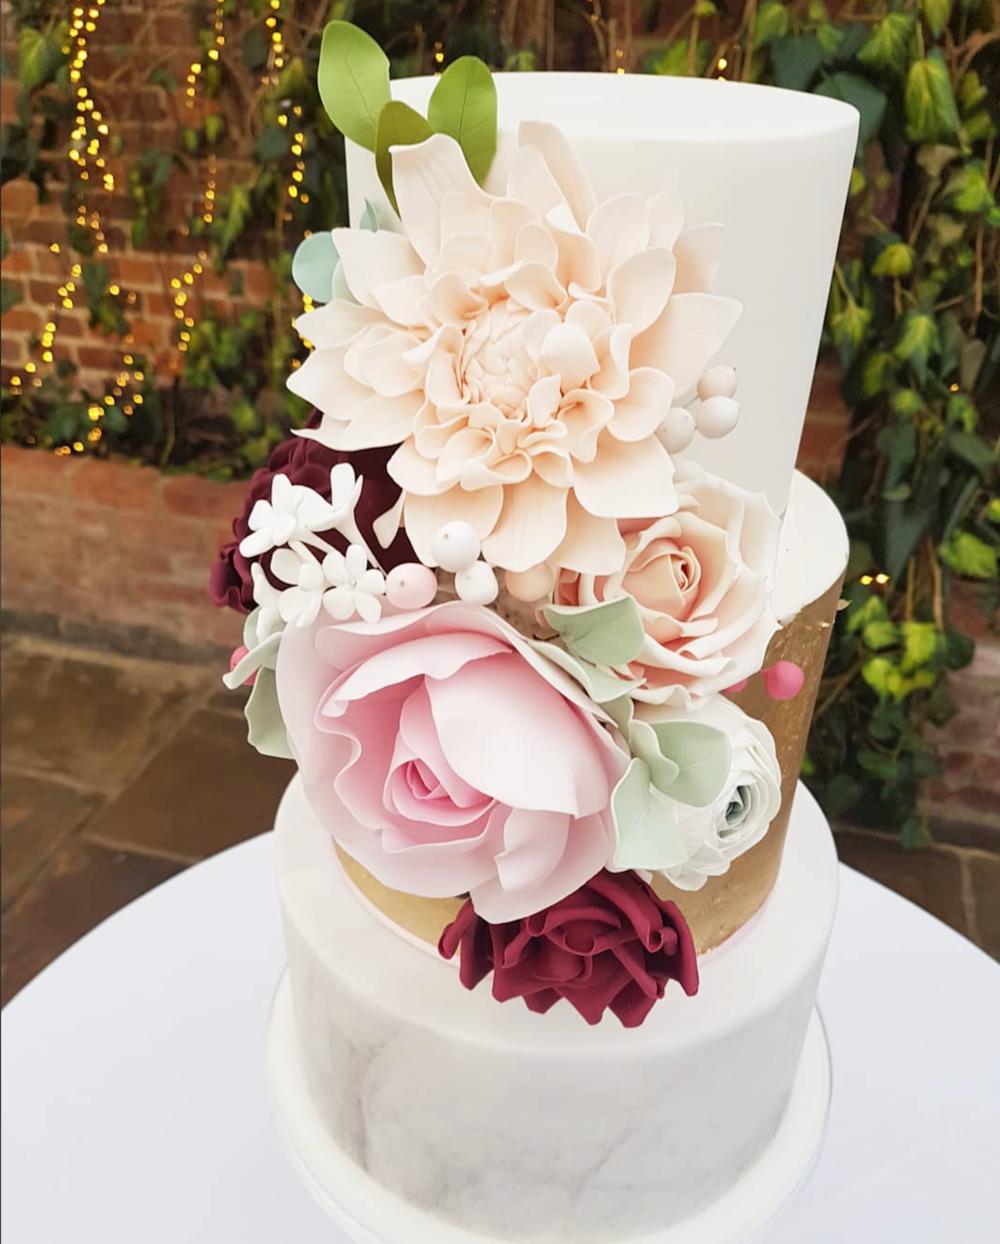 DOTTY ROSE CAKE DESIGN MARBLED WEDDING CAKE.png